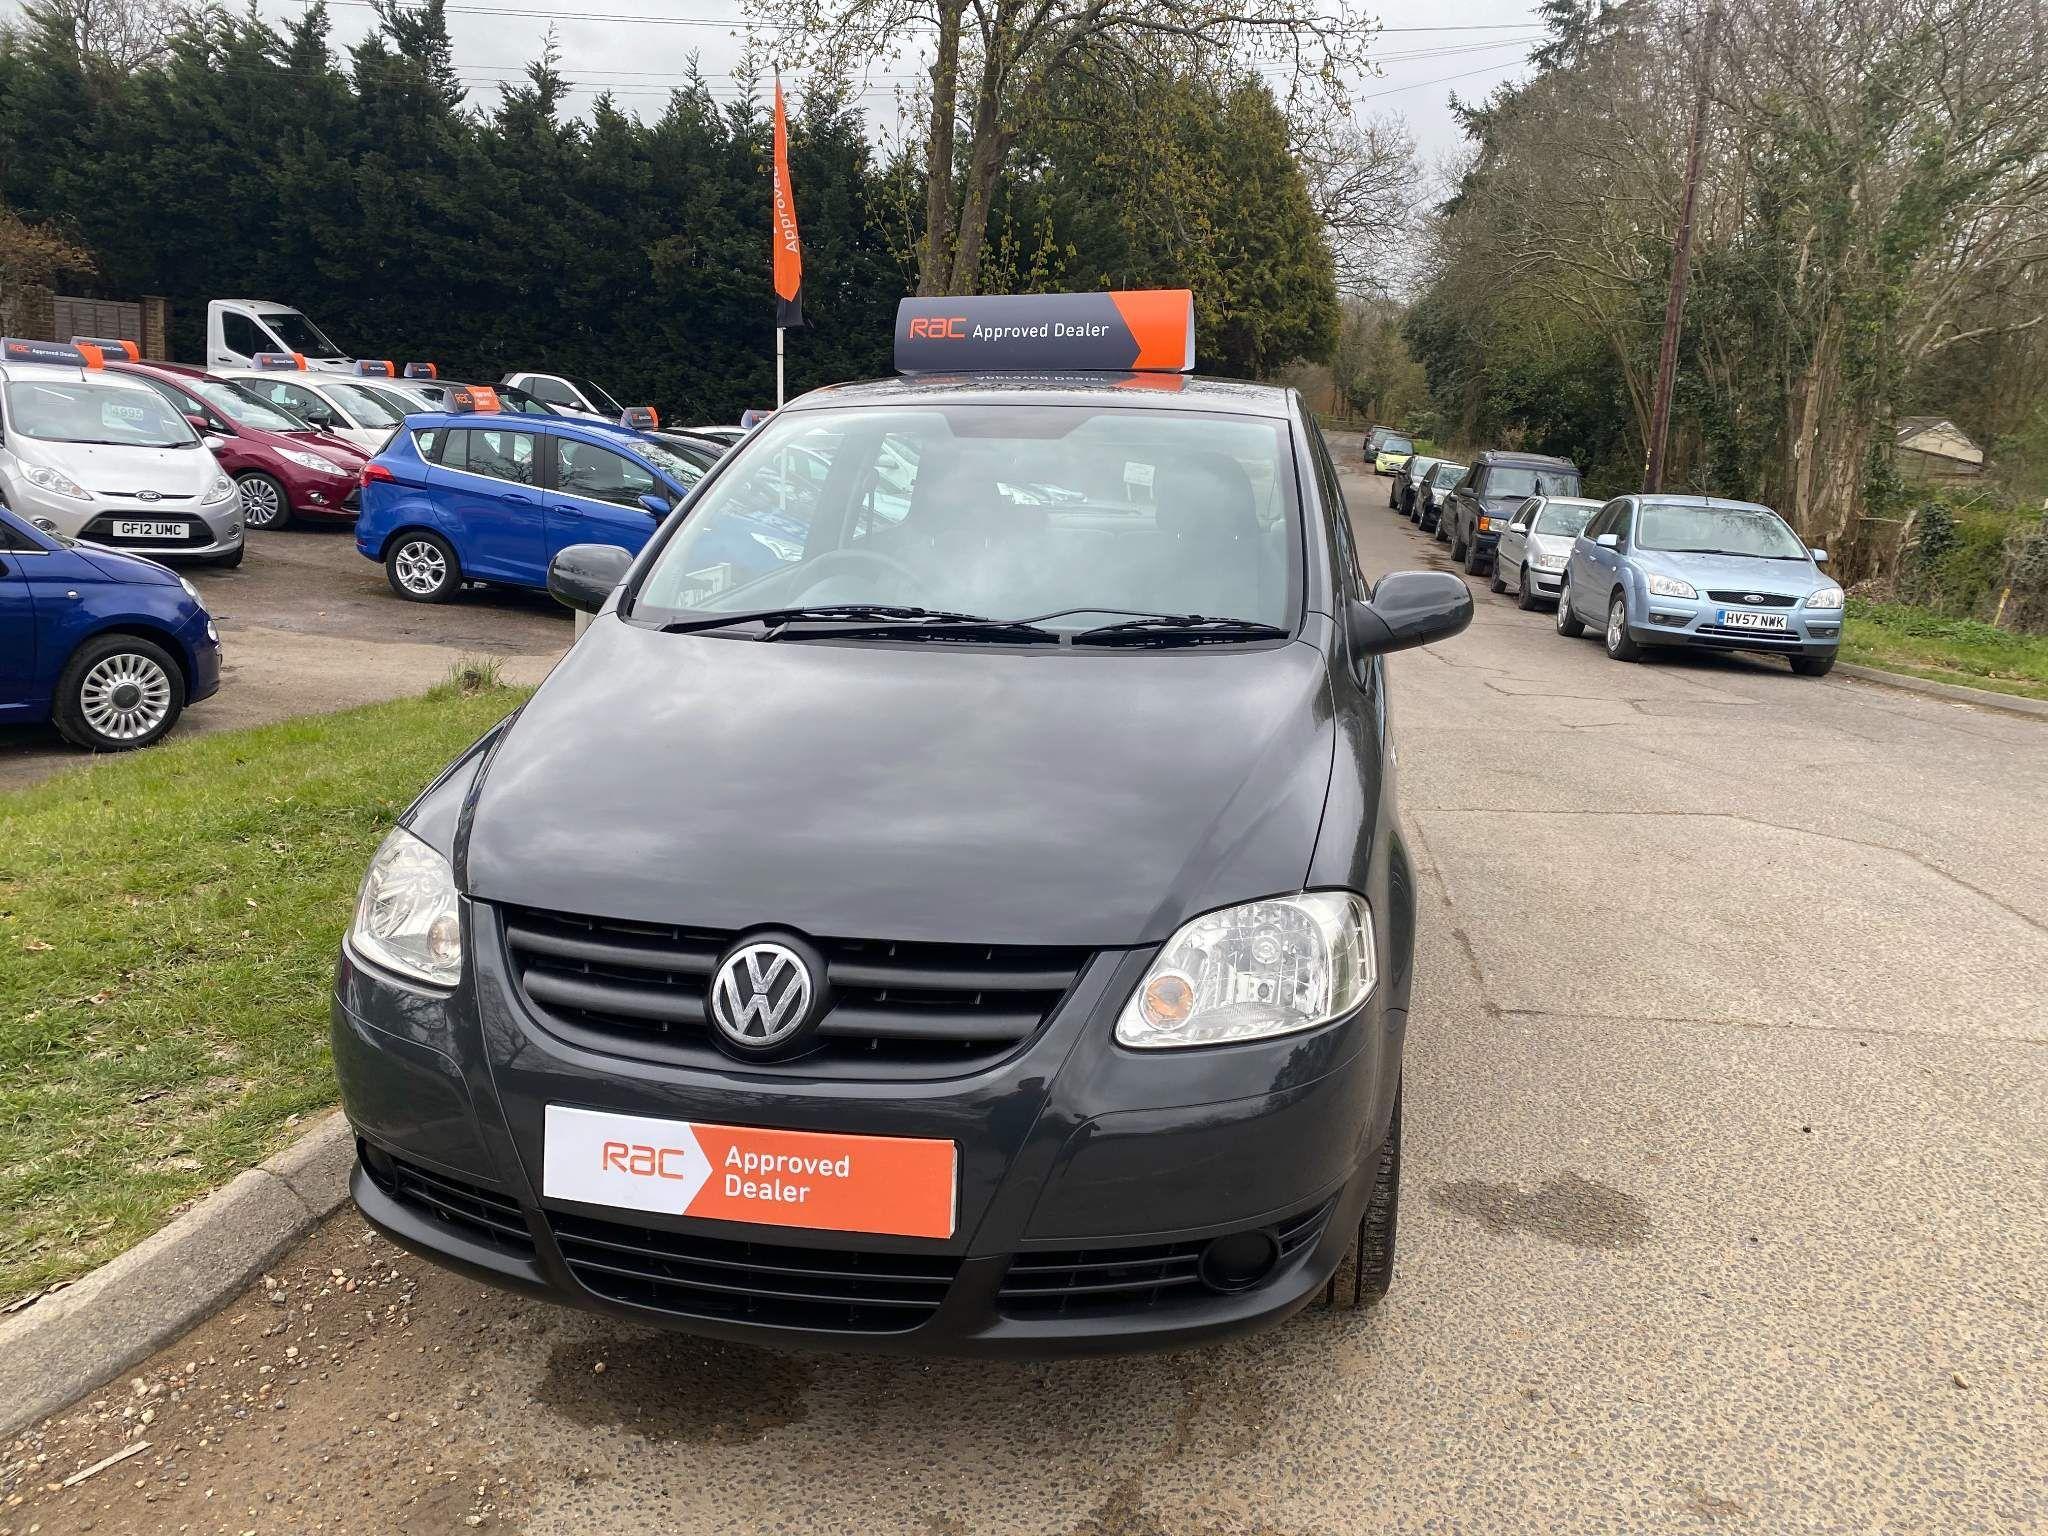 Used Volkswagen Fox for sale